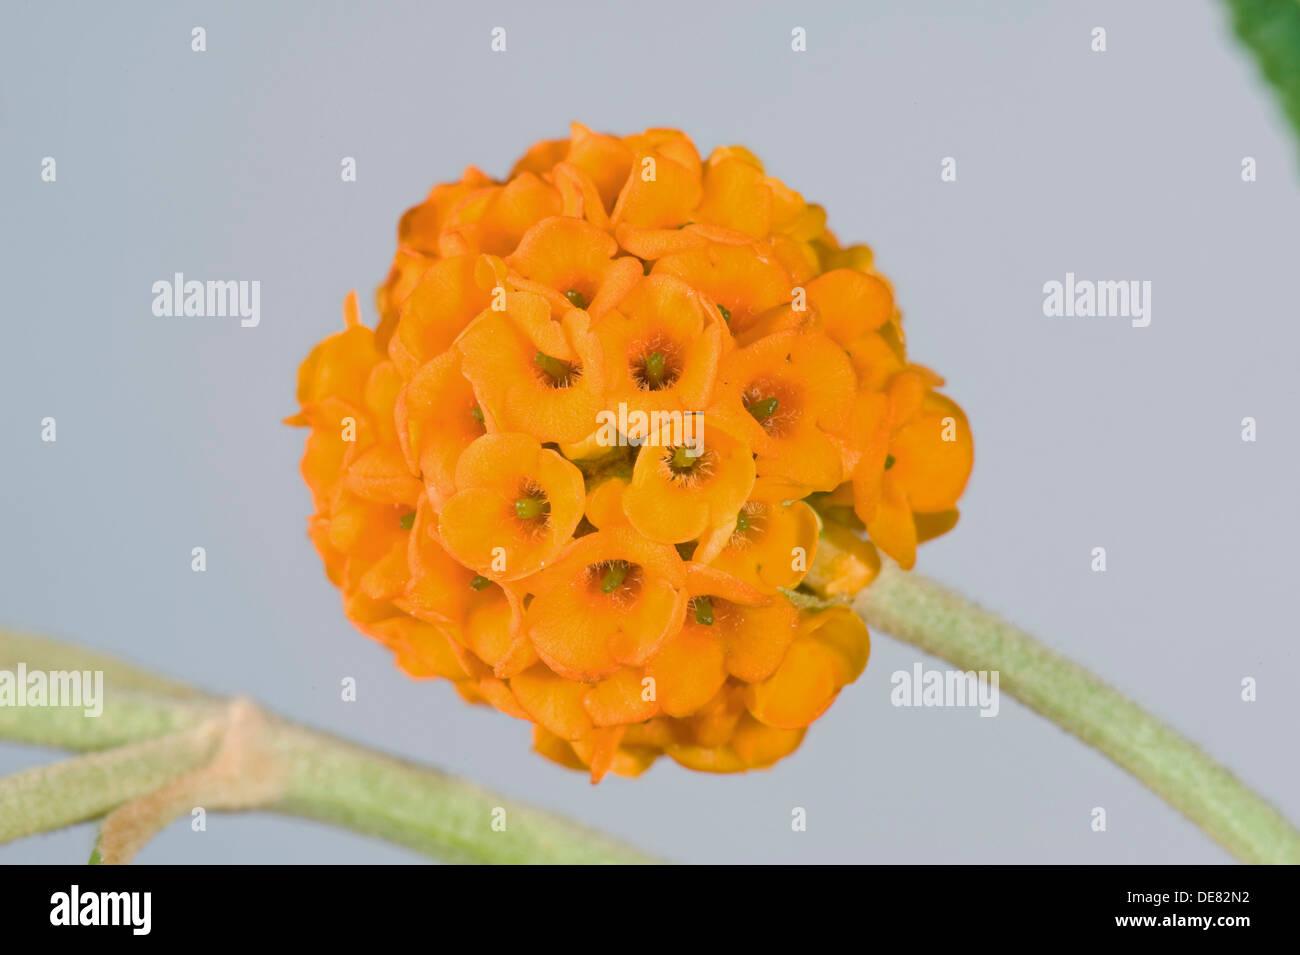 Sfera arancione, buddleja Buddleja glabosa, grande arbusto a fioritura Immagini Stock